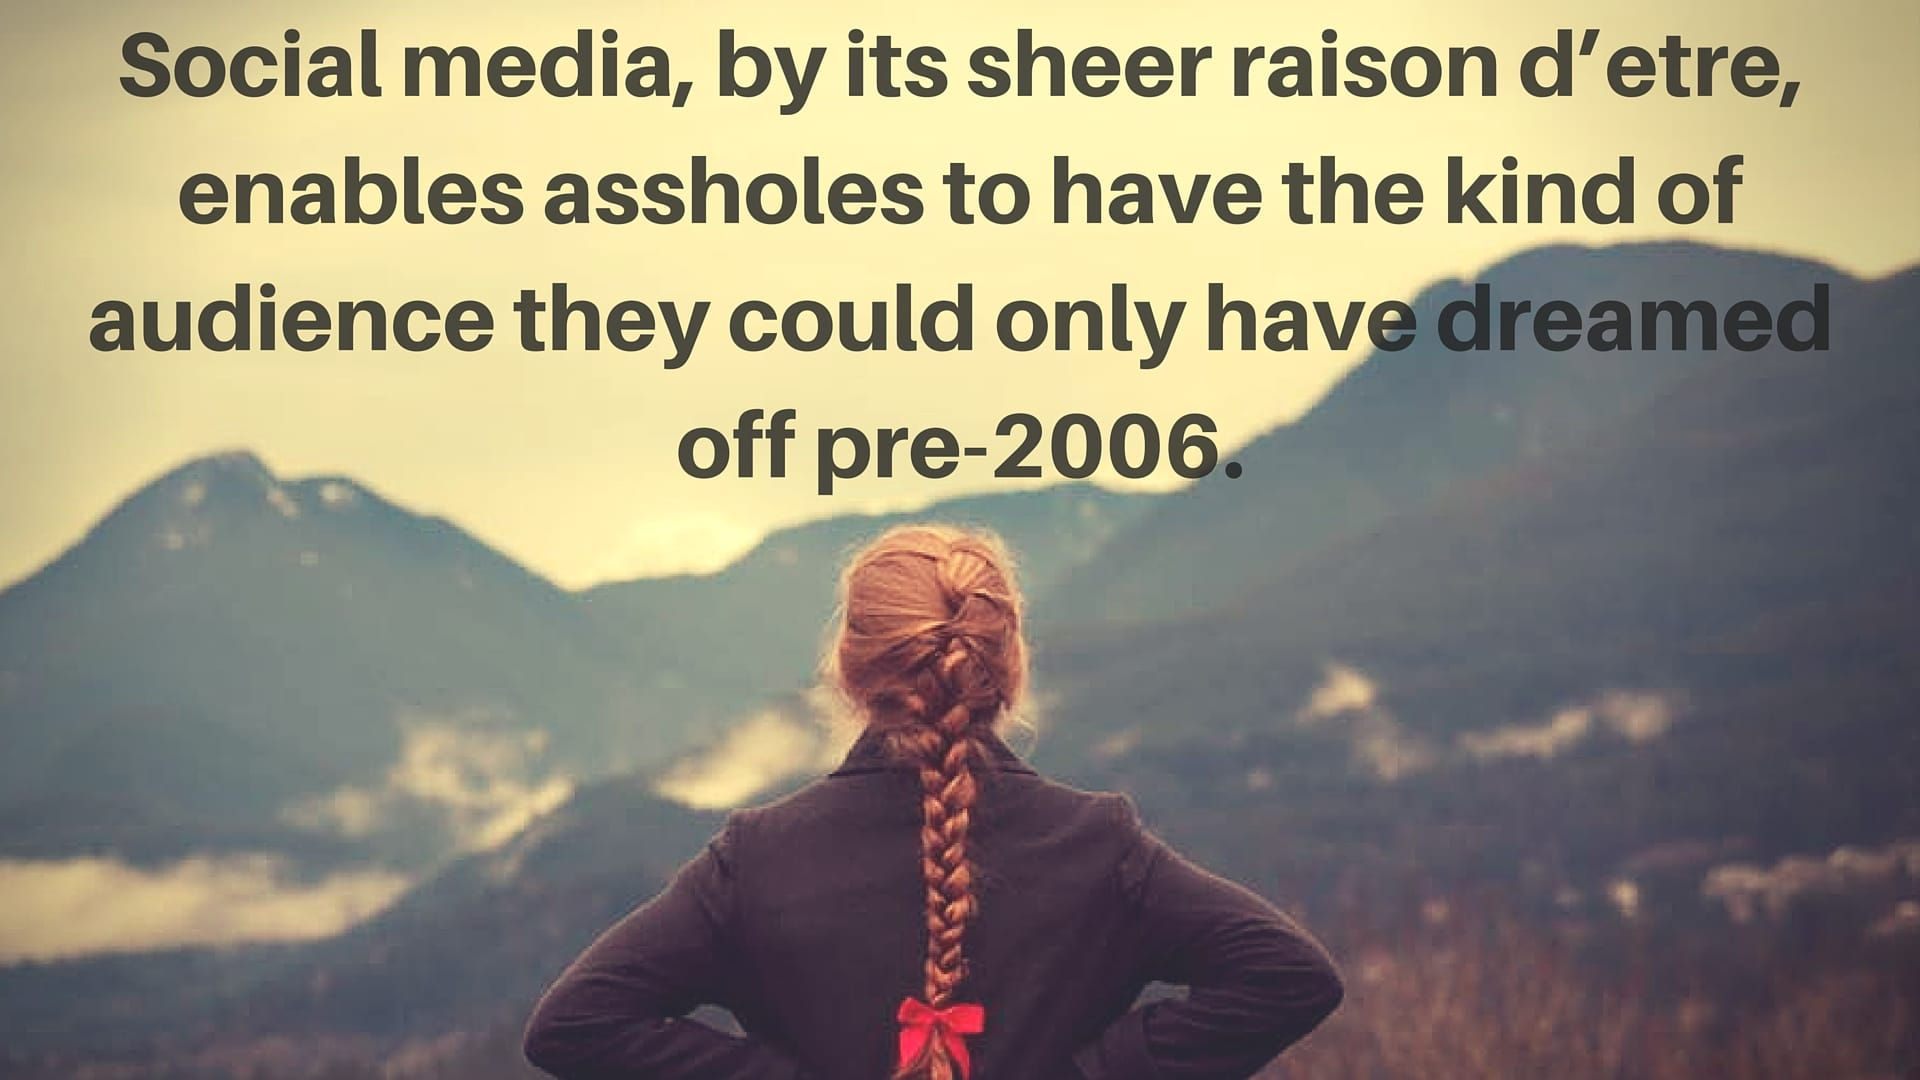 Social media assholes